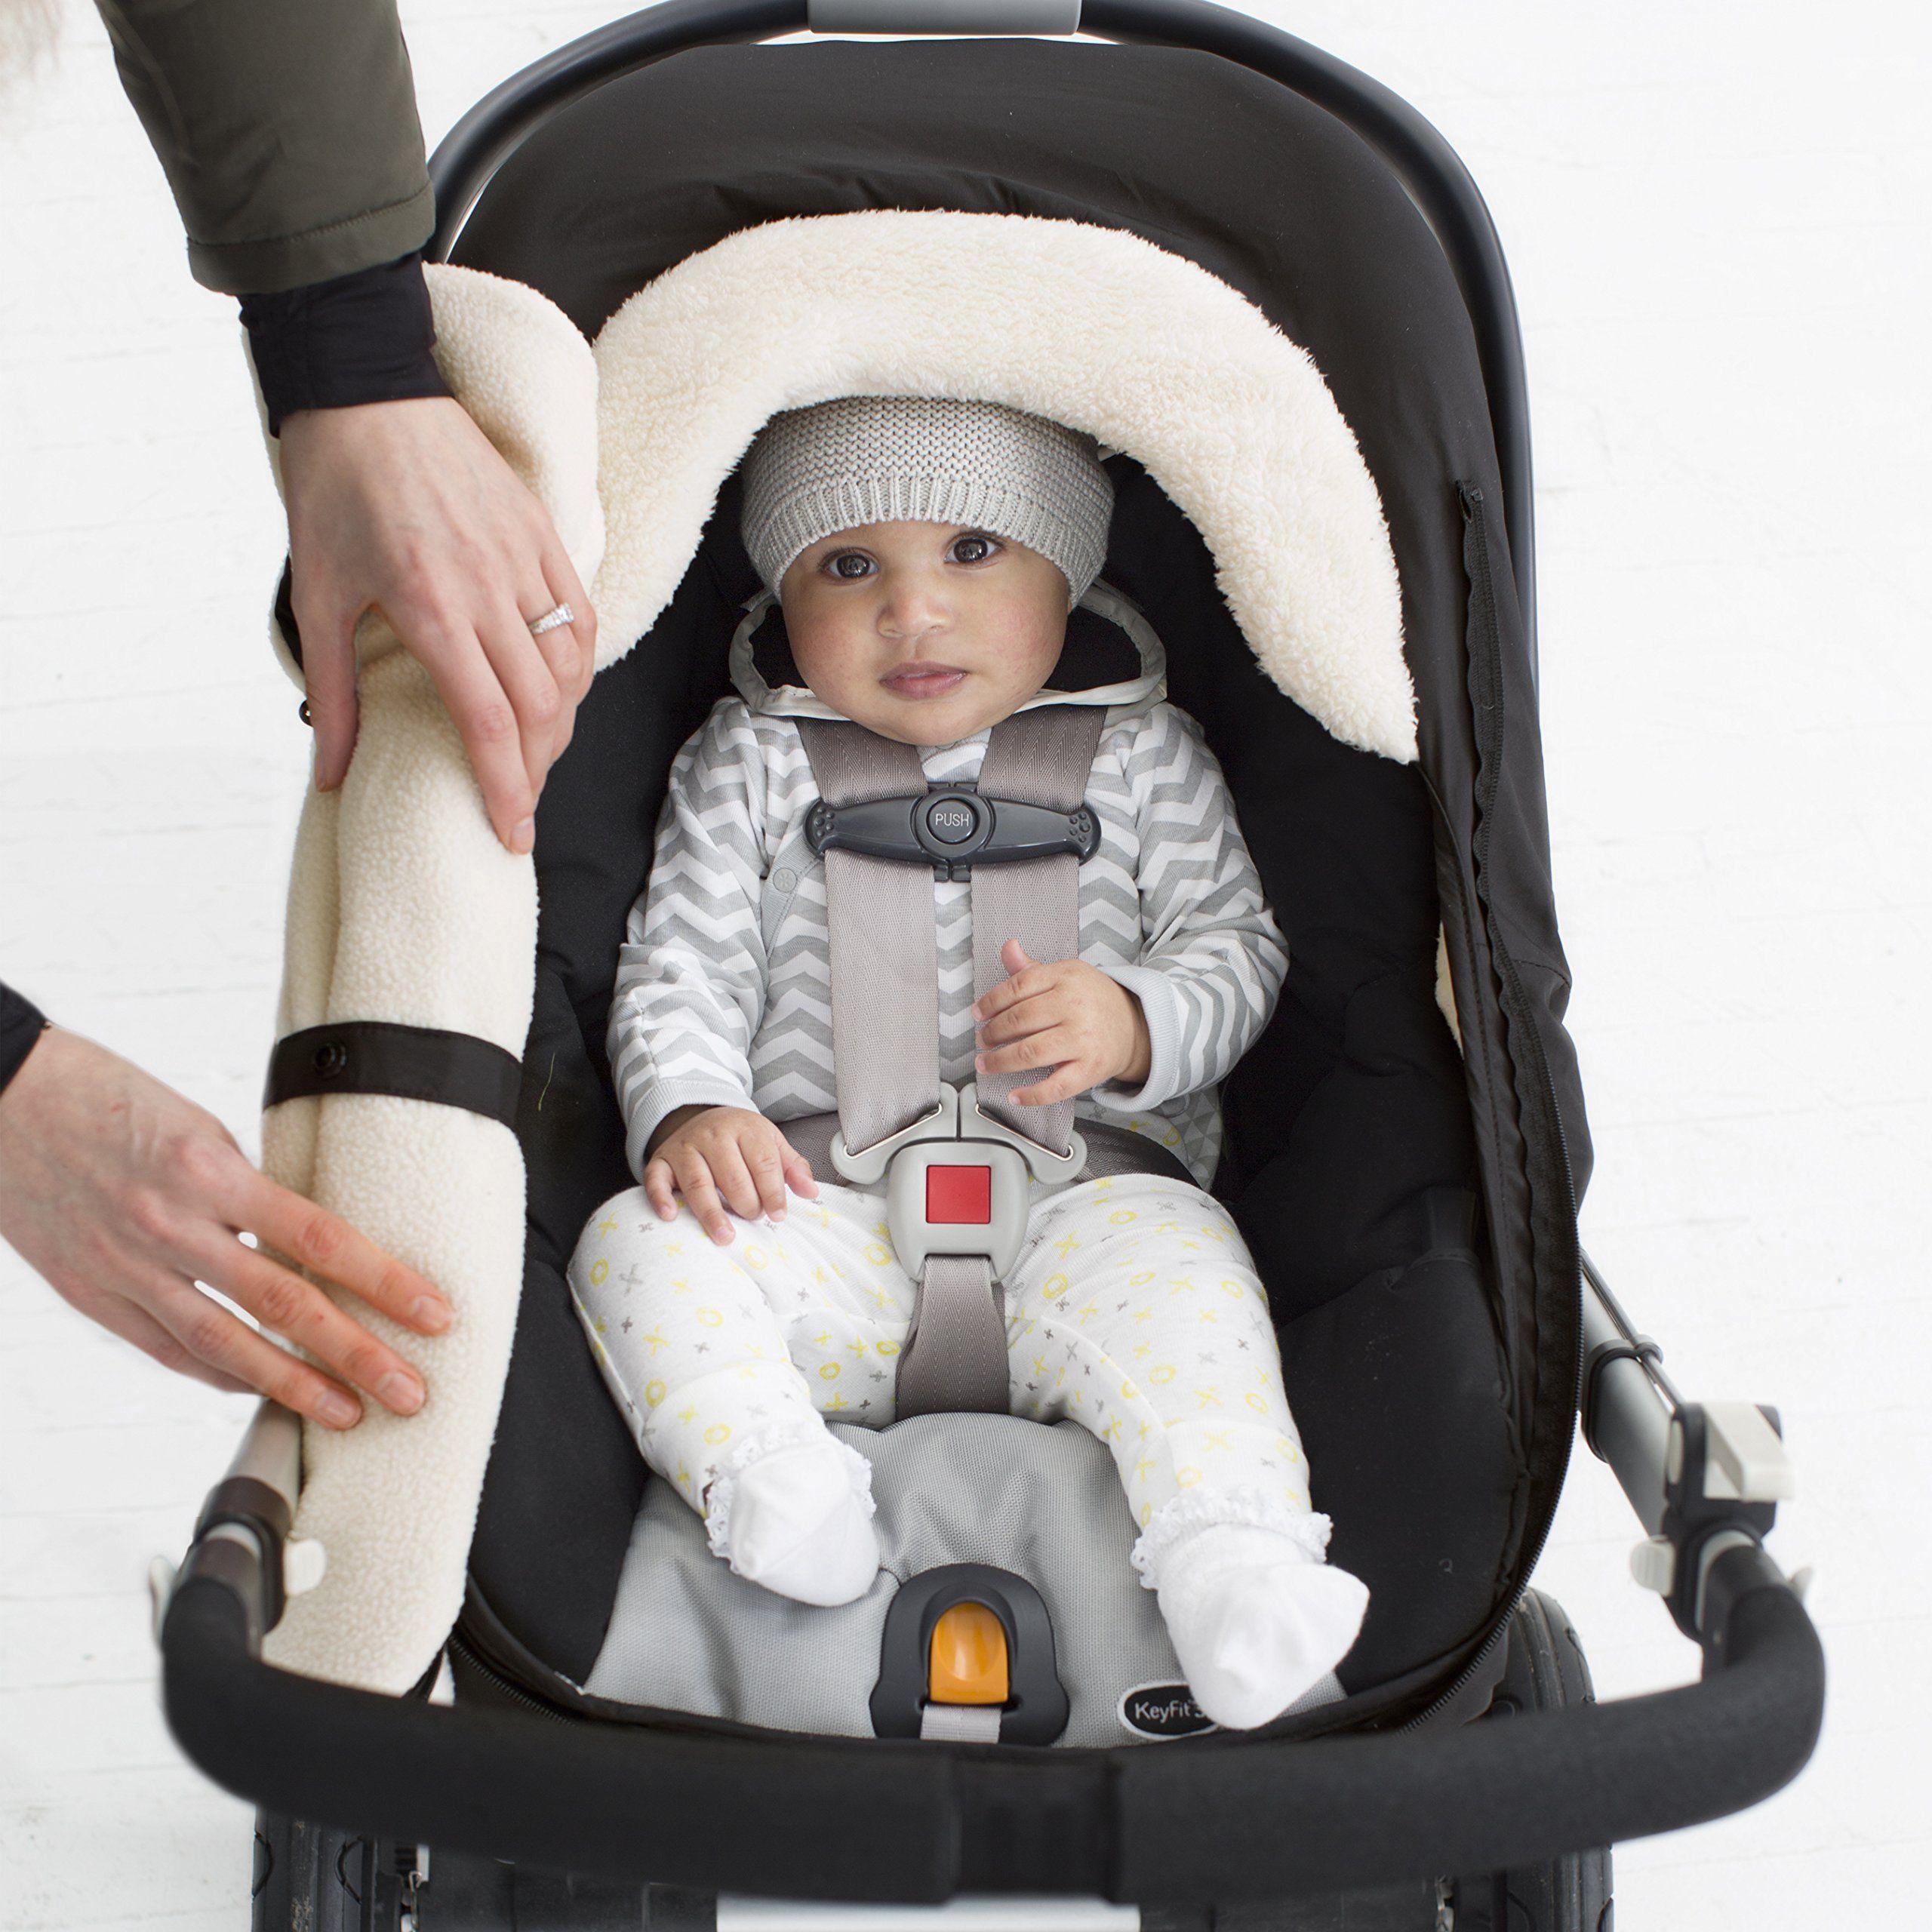 Skip Hop Stroll BabyCarSeat Baby car seats, Car seats